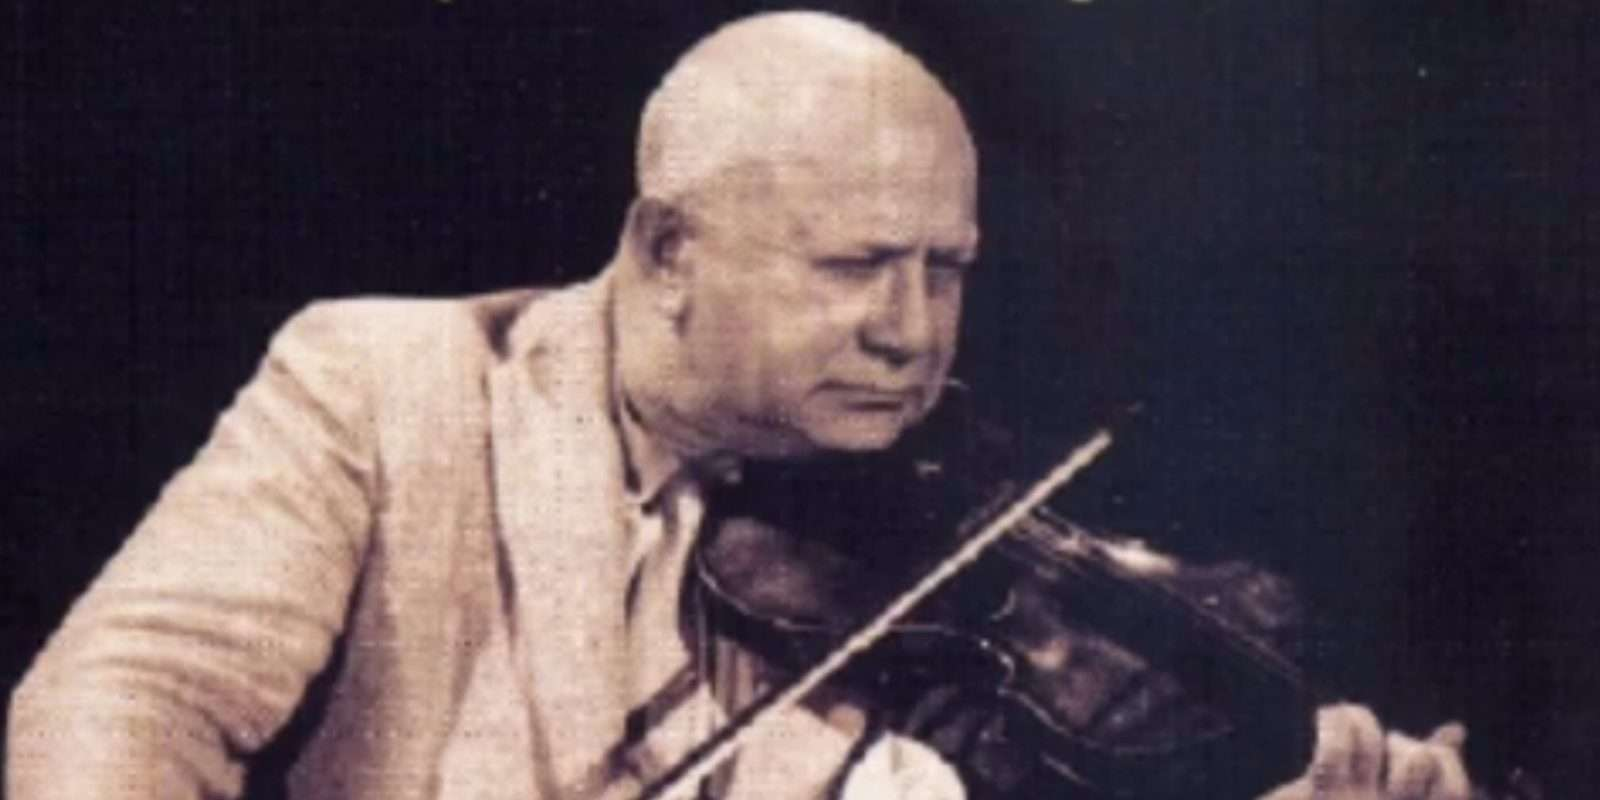 NEW TO YOUTUBE | Violinist Mischa Elman - Bruch Violin Concerto [1956 ARCHIVAL]